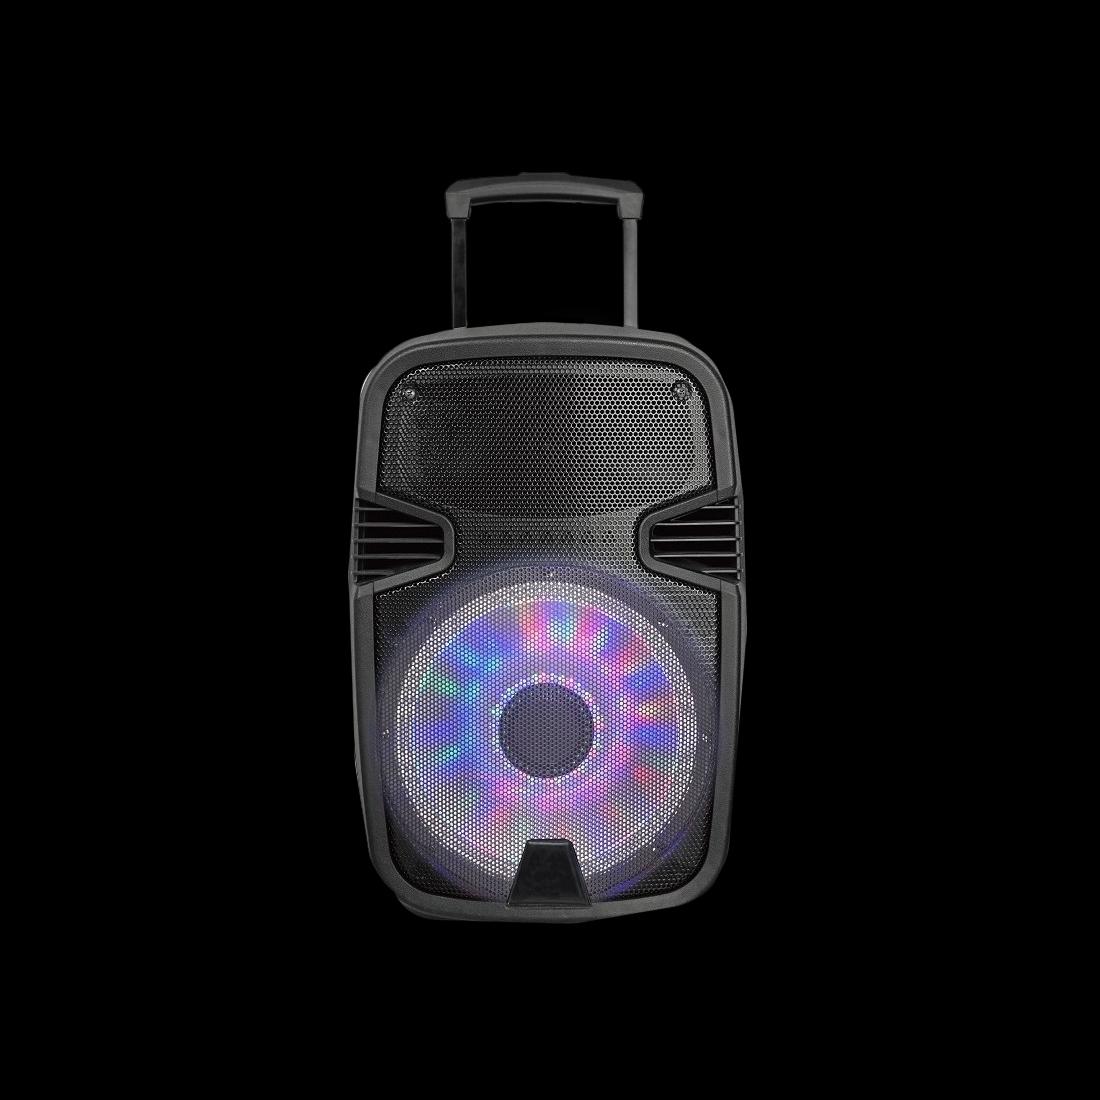 "Sakkyo NPL2213 - Altavoces amplificados de 12"" con micros inalámbricos para trabajar a nivel profesional."